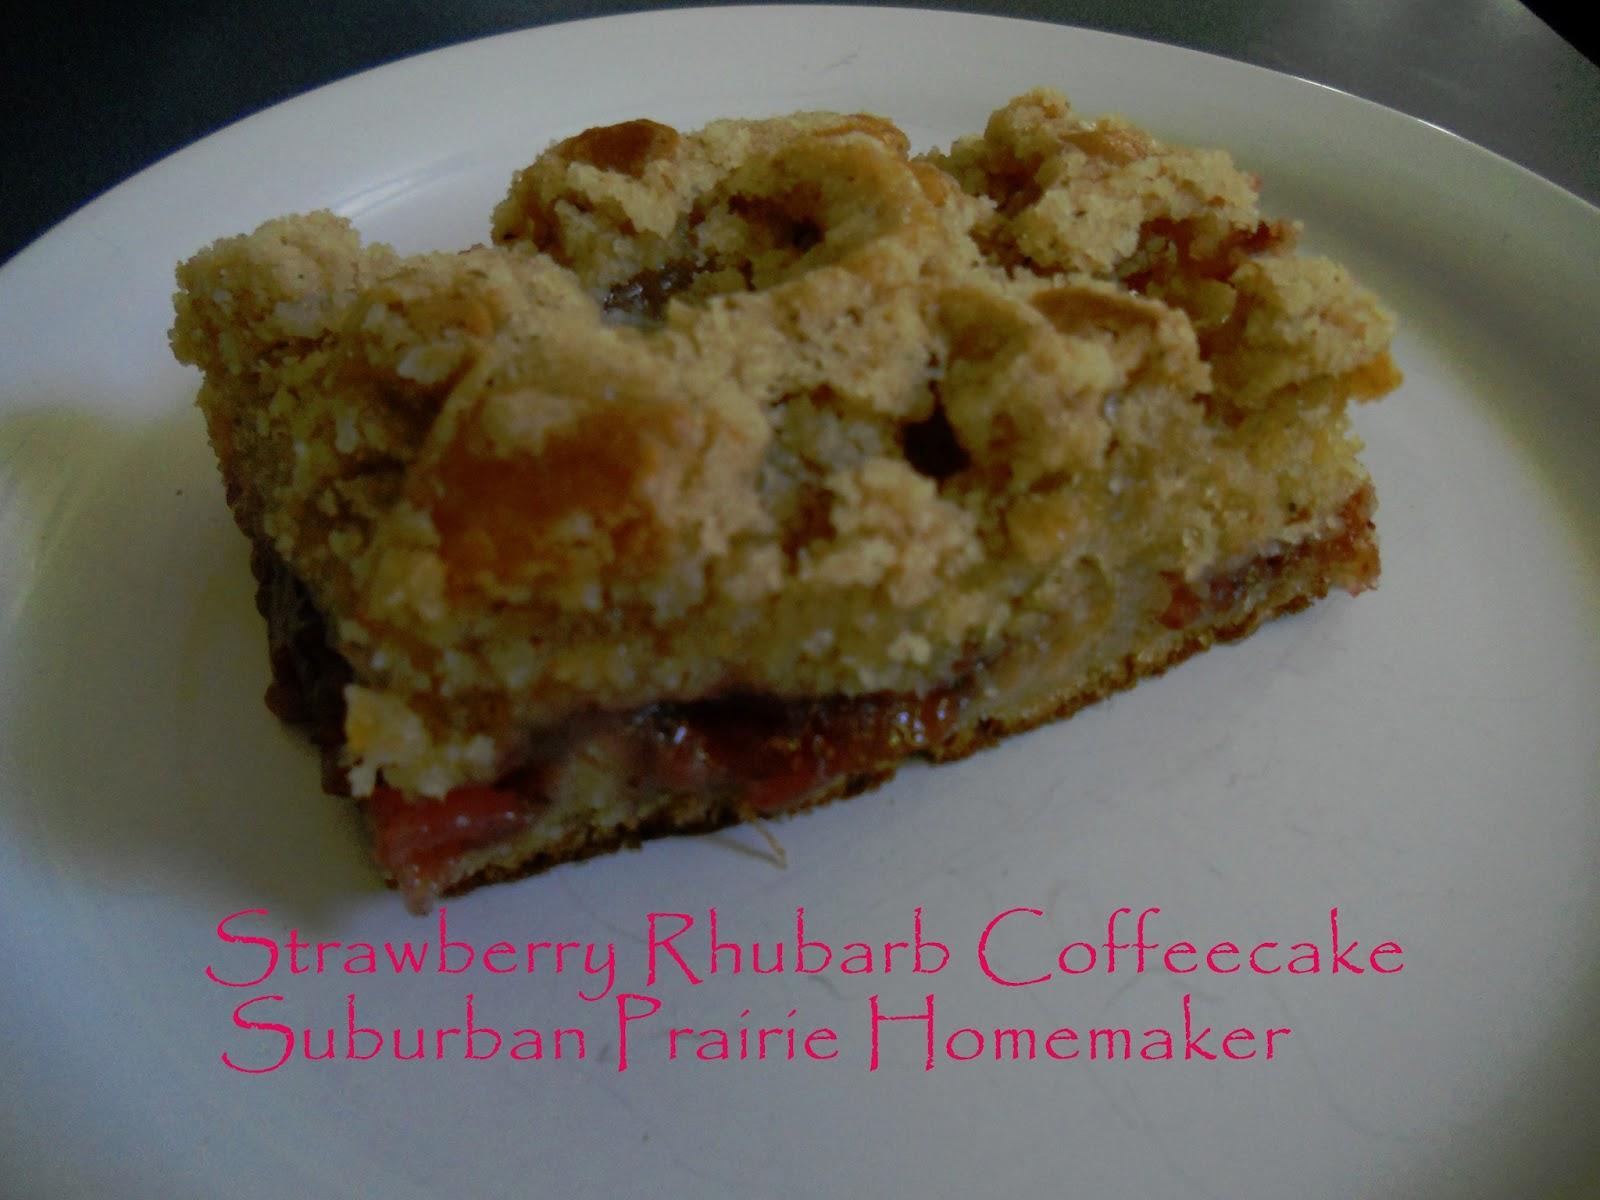 Rhubarb Coffee Cake With Yellow Cake Mix